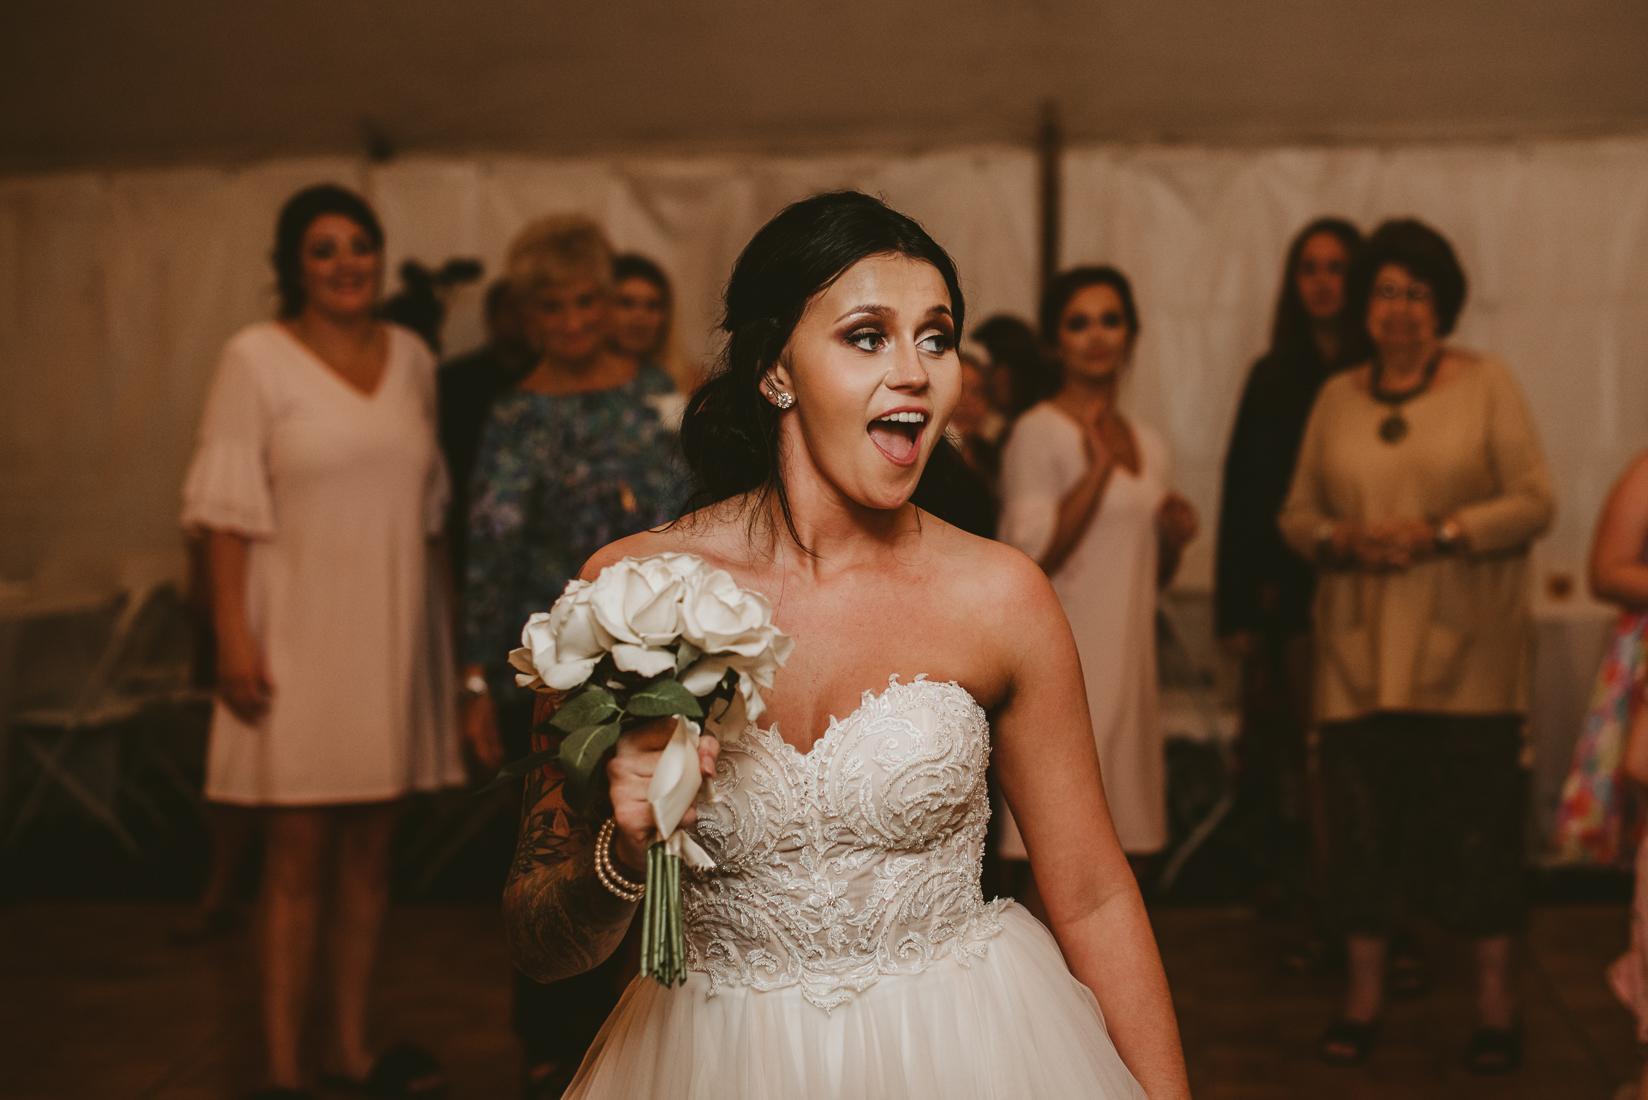 olivia_zay_wedding_09_2018-0699.jpg